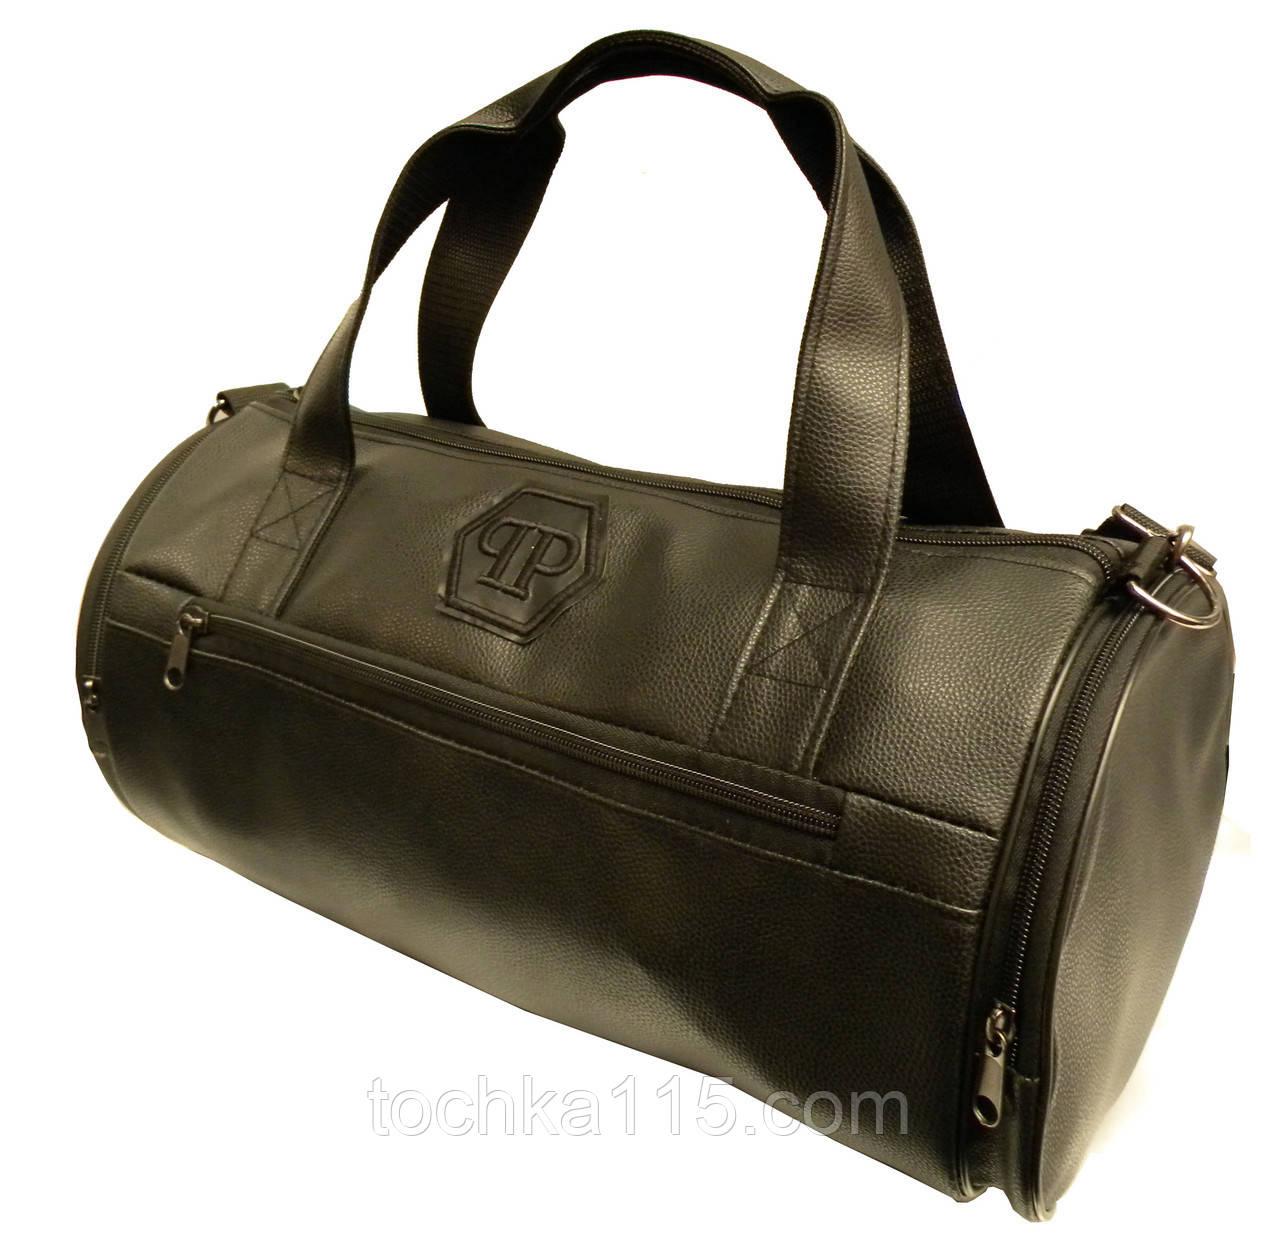 a9a61e69 Кожаная сумка бочка Philipp Plein, черная мужская сумка PP, женская сумка  для тренировок Филипп